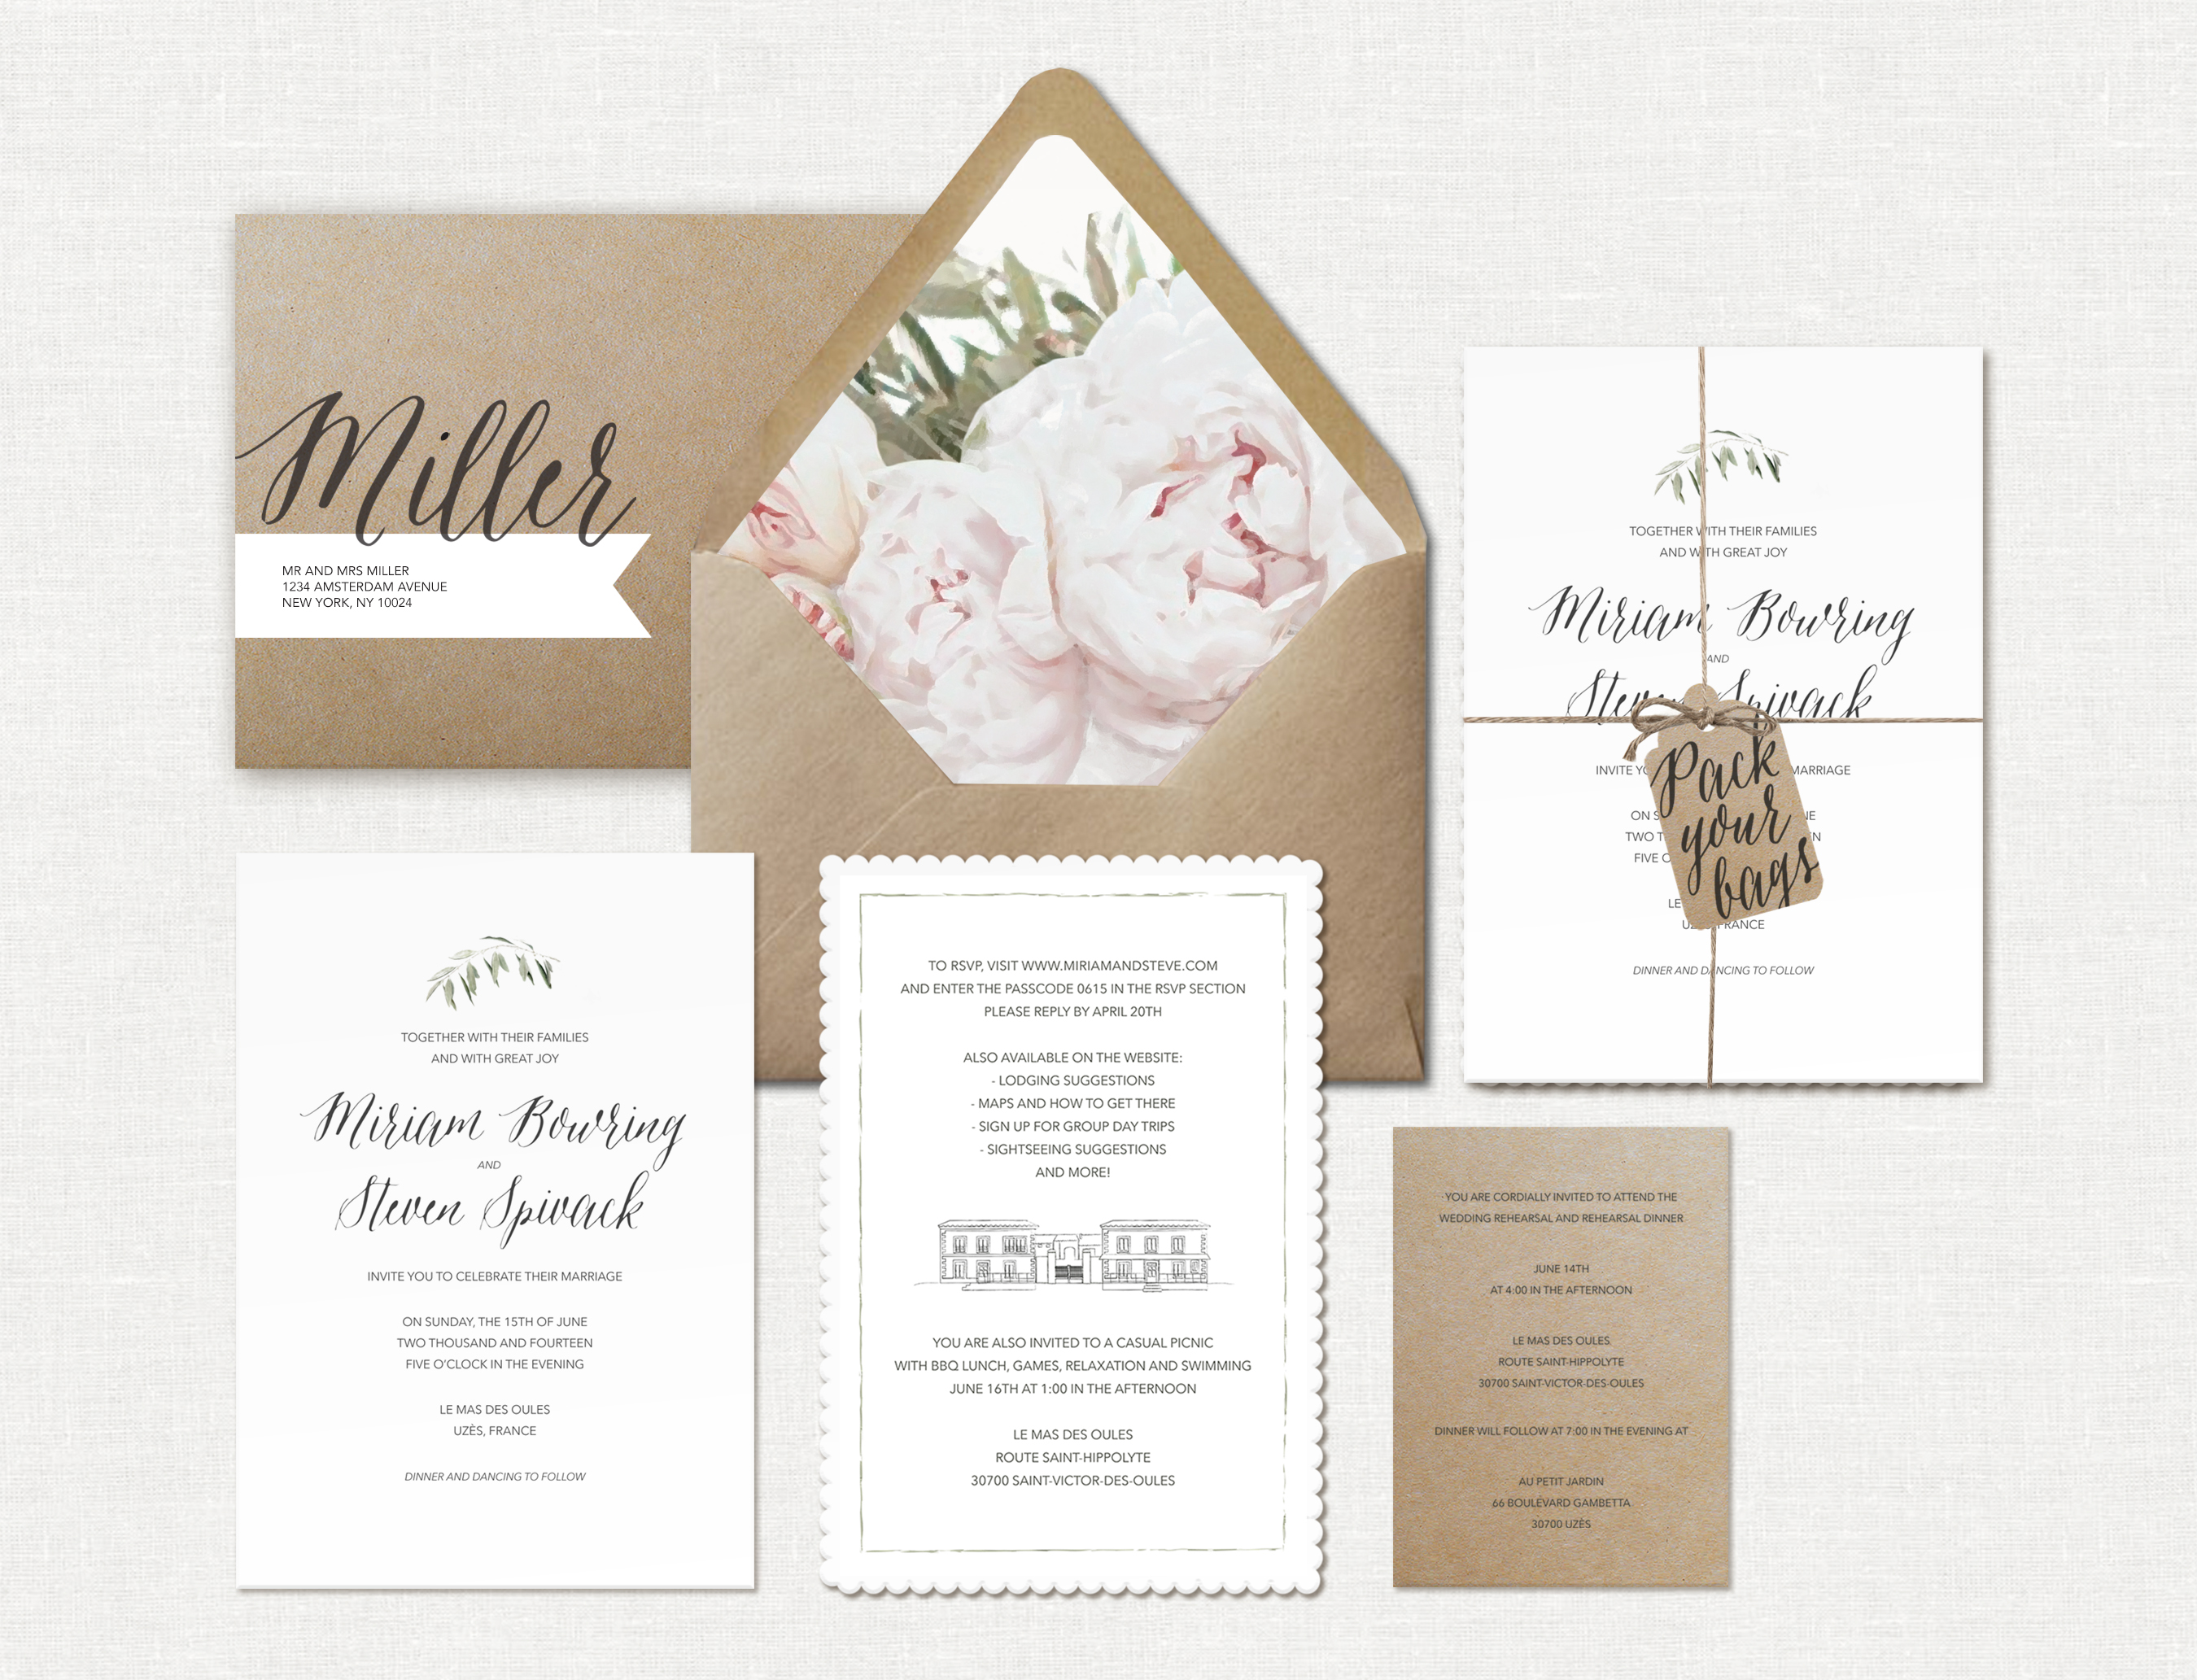 Wedding Suite Miriam Spivack